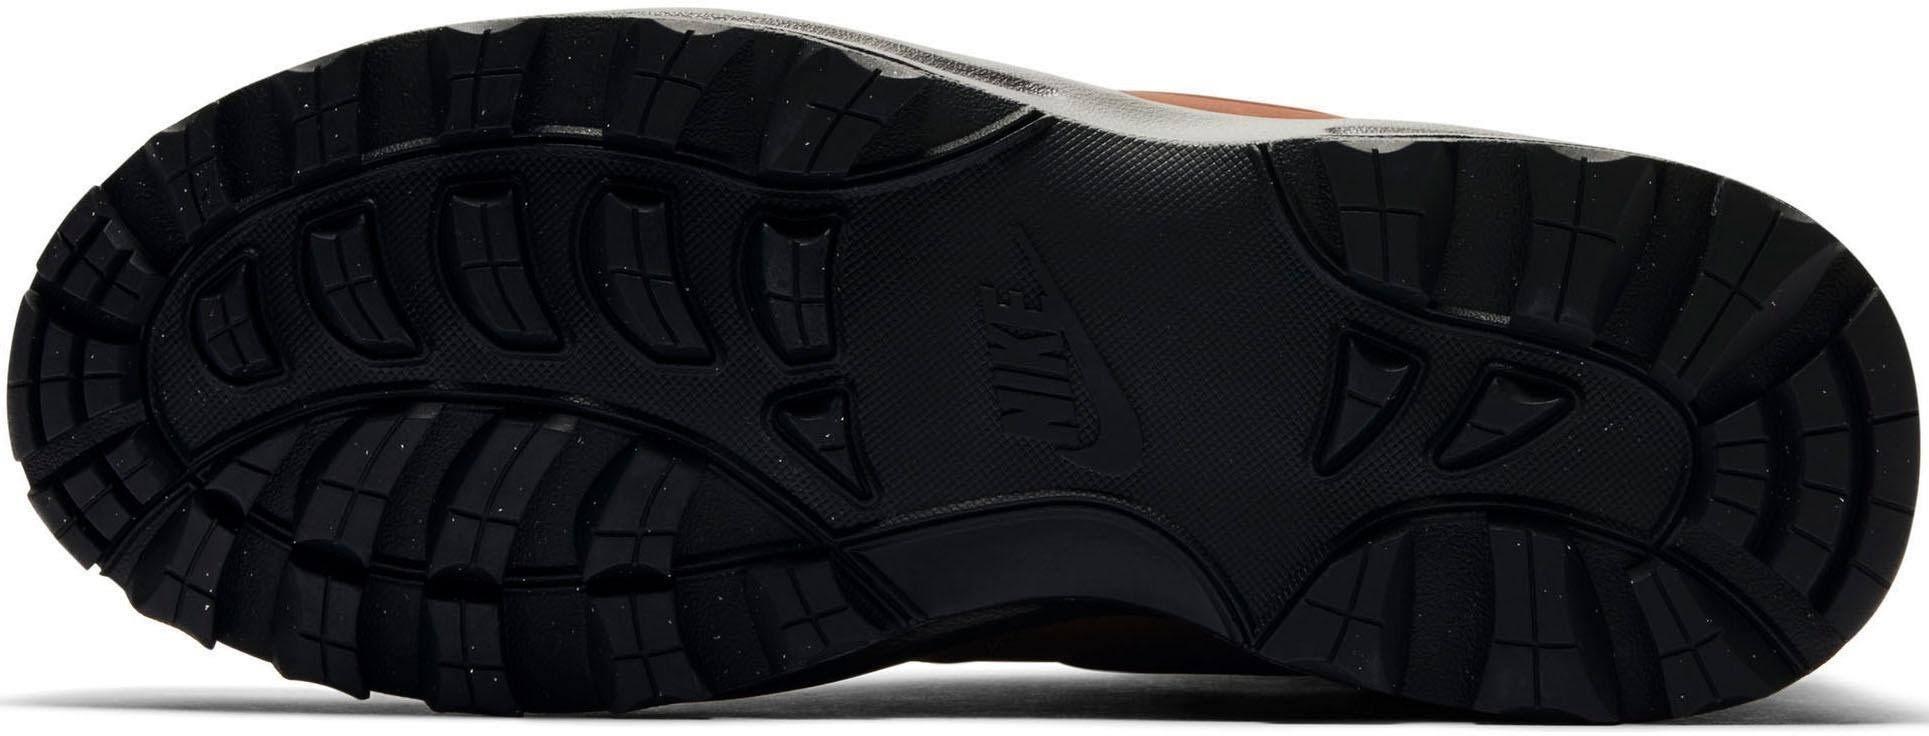 Brown winterschuhe fauna fauna 43 Fauna Nike Manoa Brown Brown Herren Leather Boot qPzfwIY